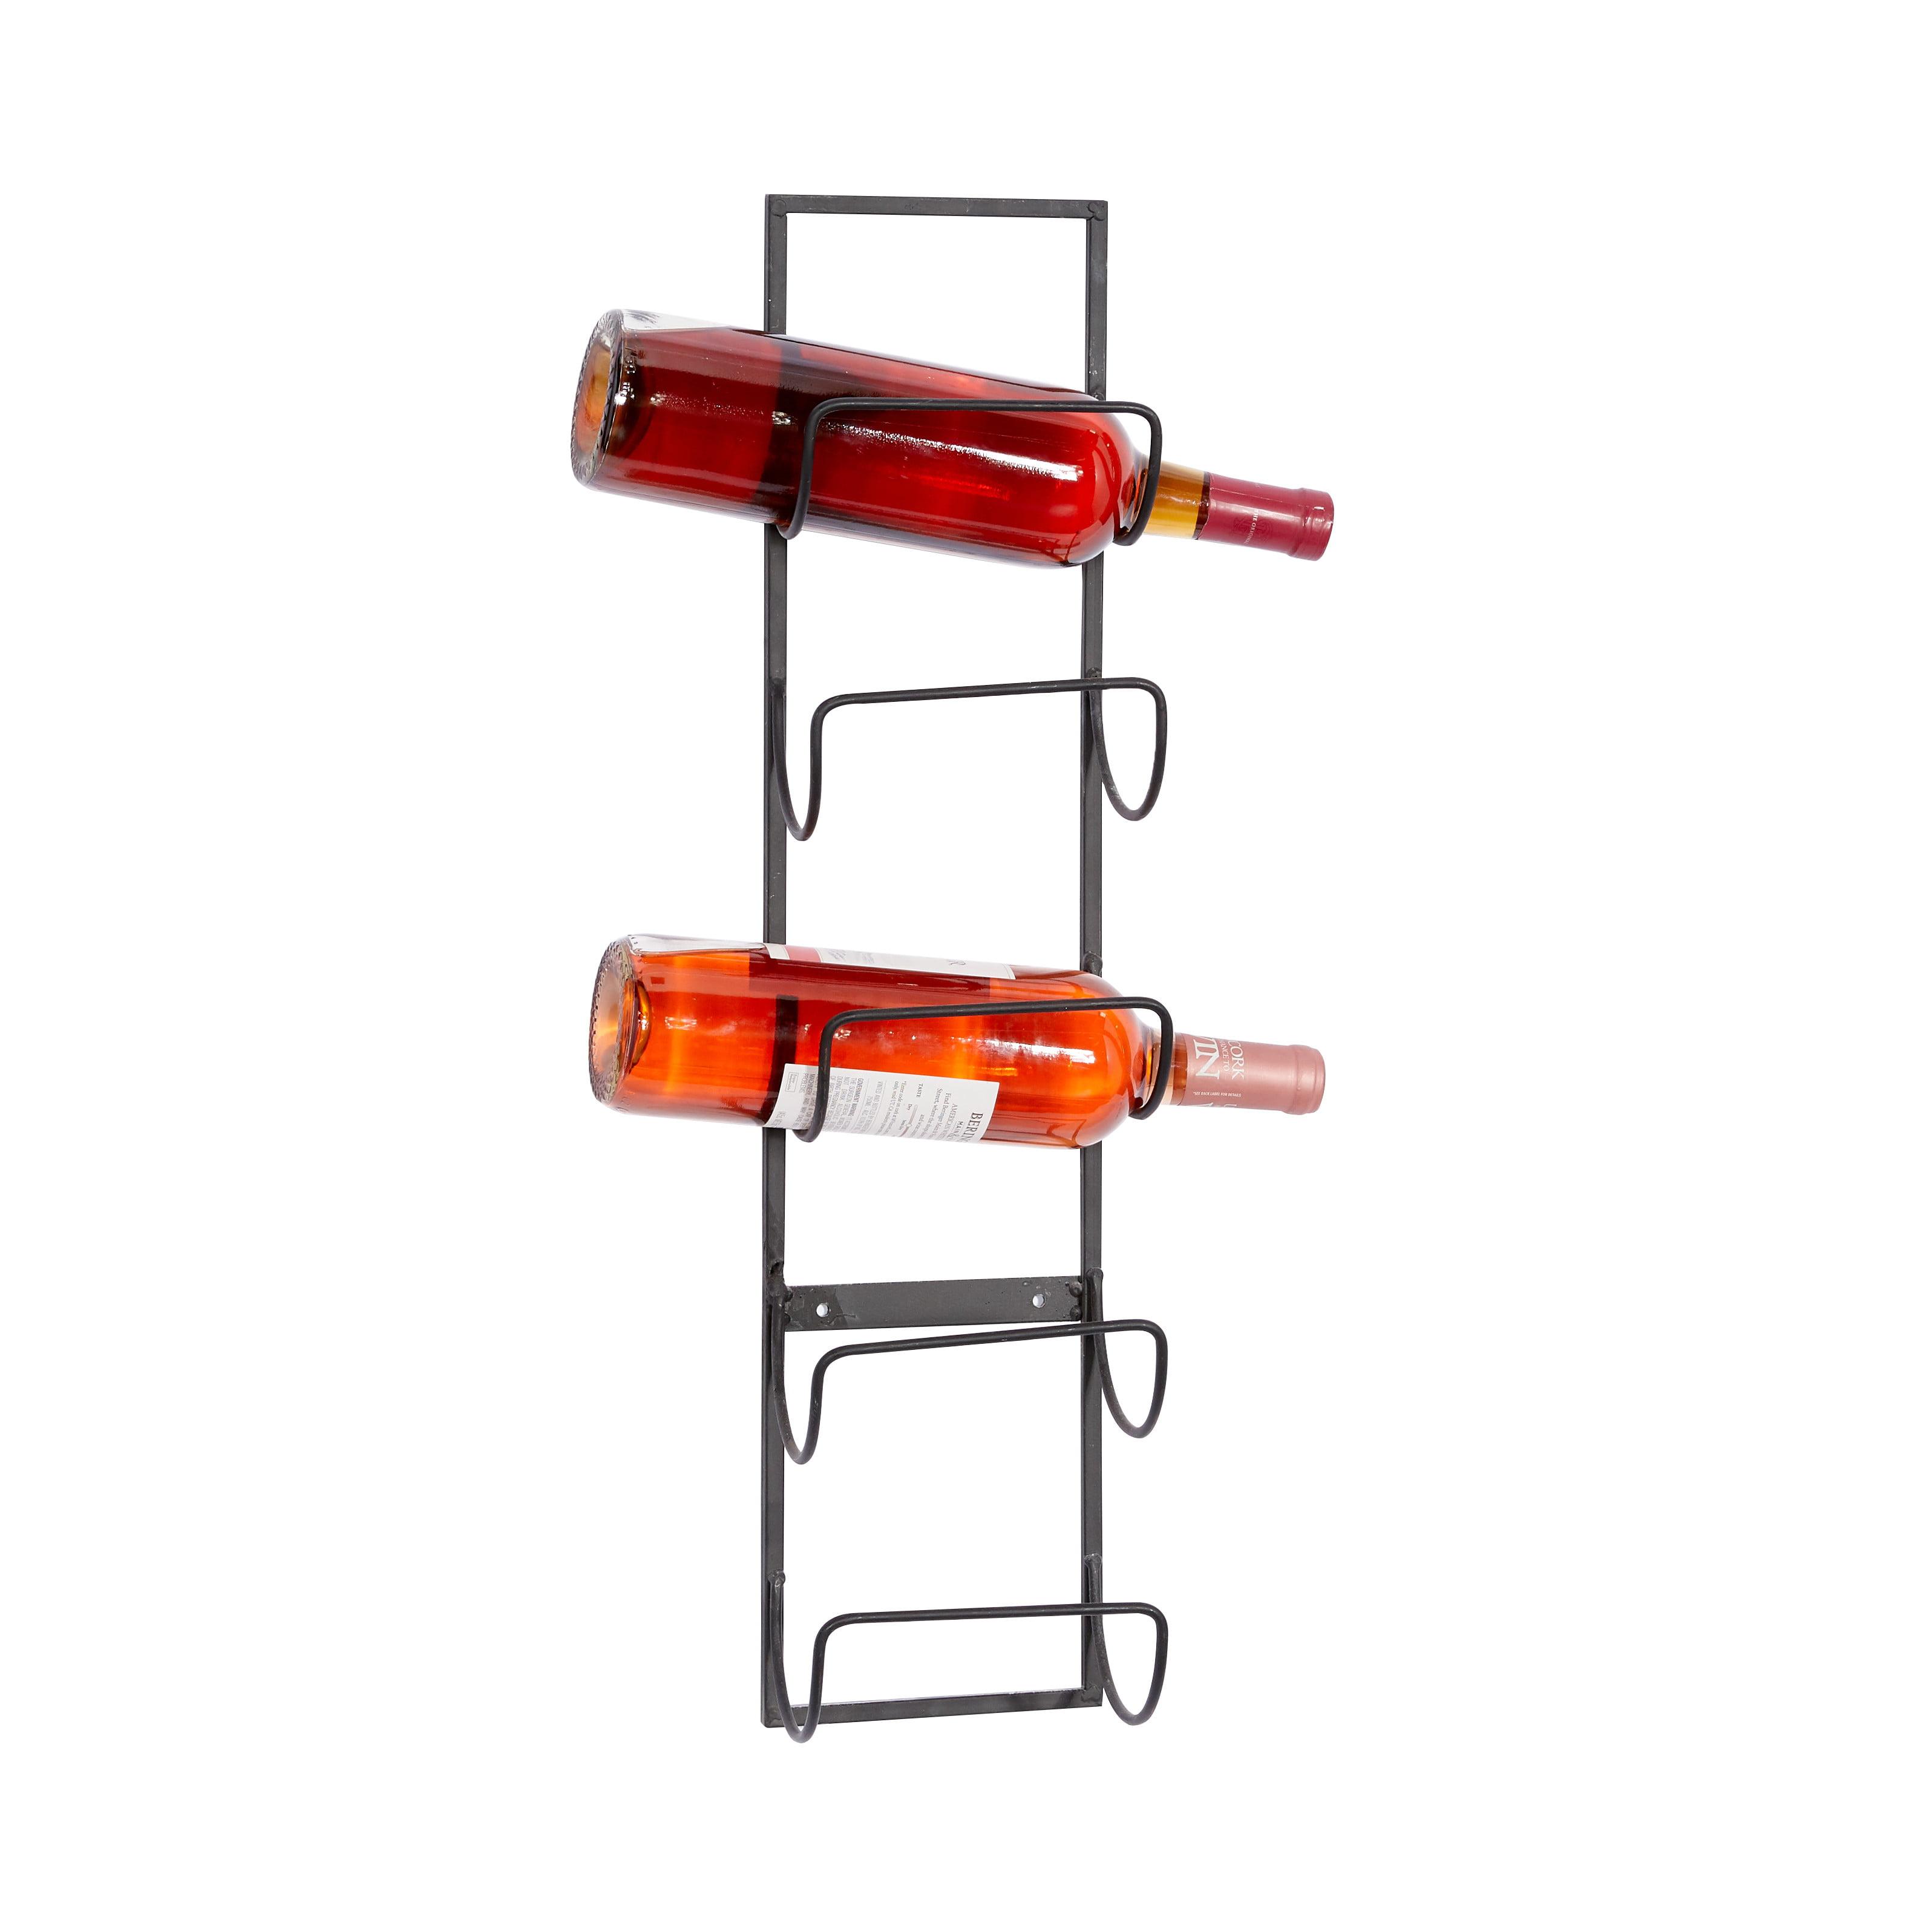 Decmode Wall Mounted Wine Rack Metal Wine Rack 6 X 5 X 25 Black Walmart Com Walmart Com